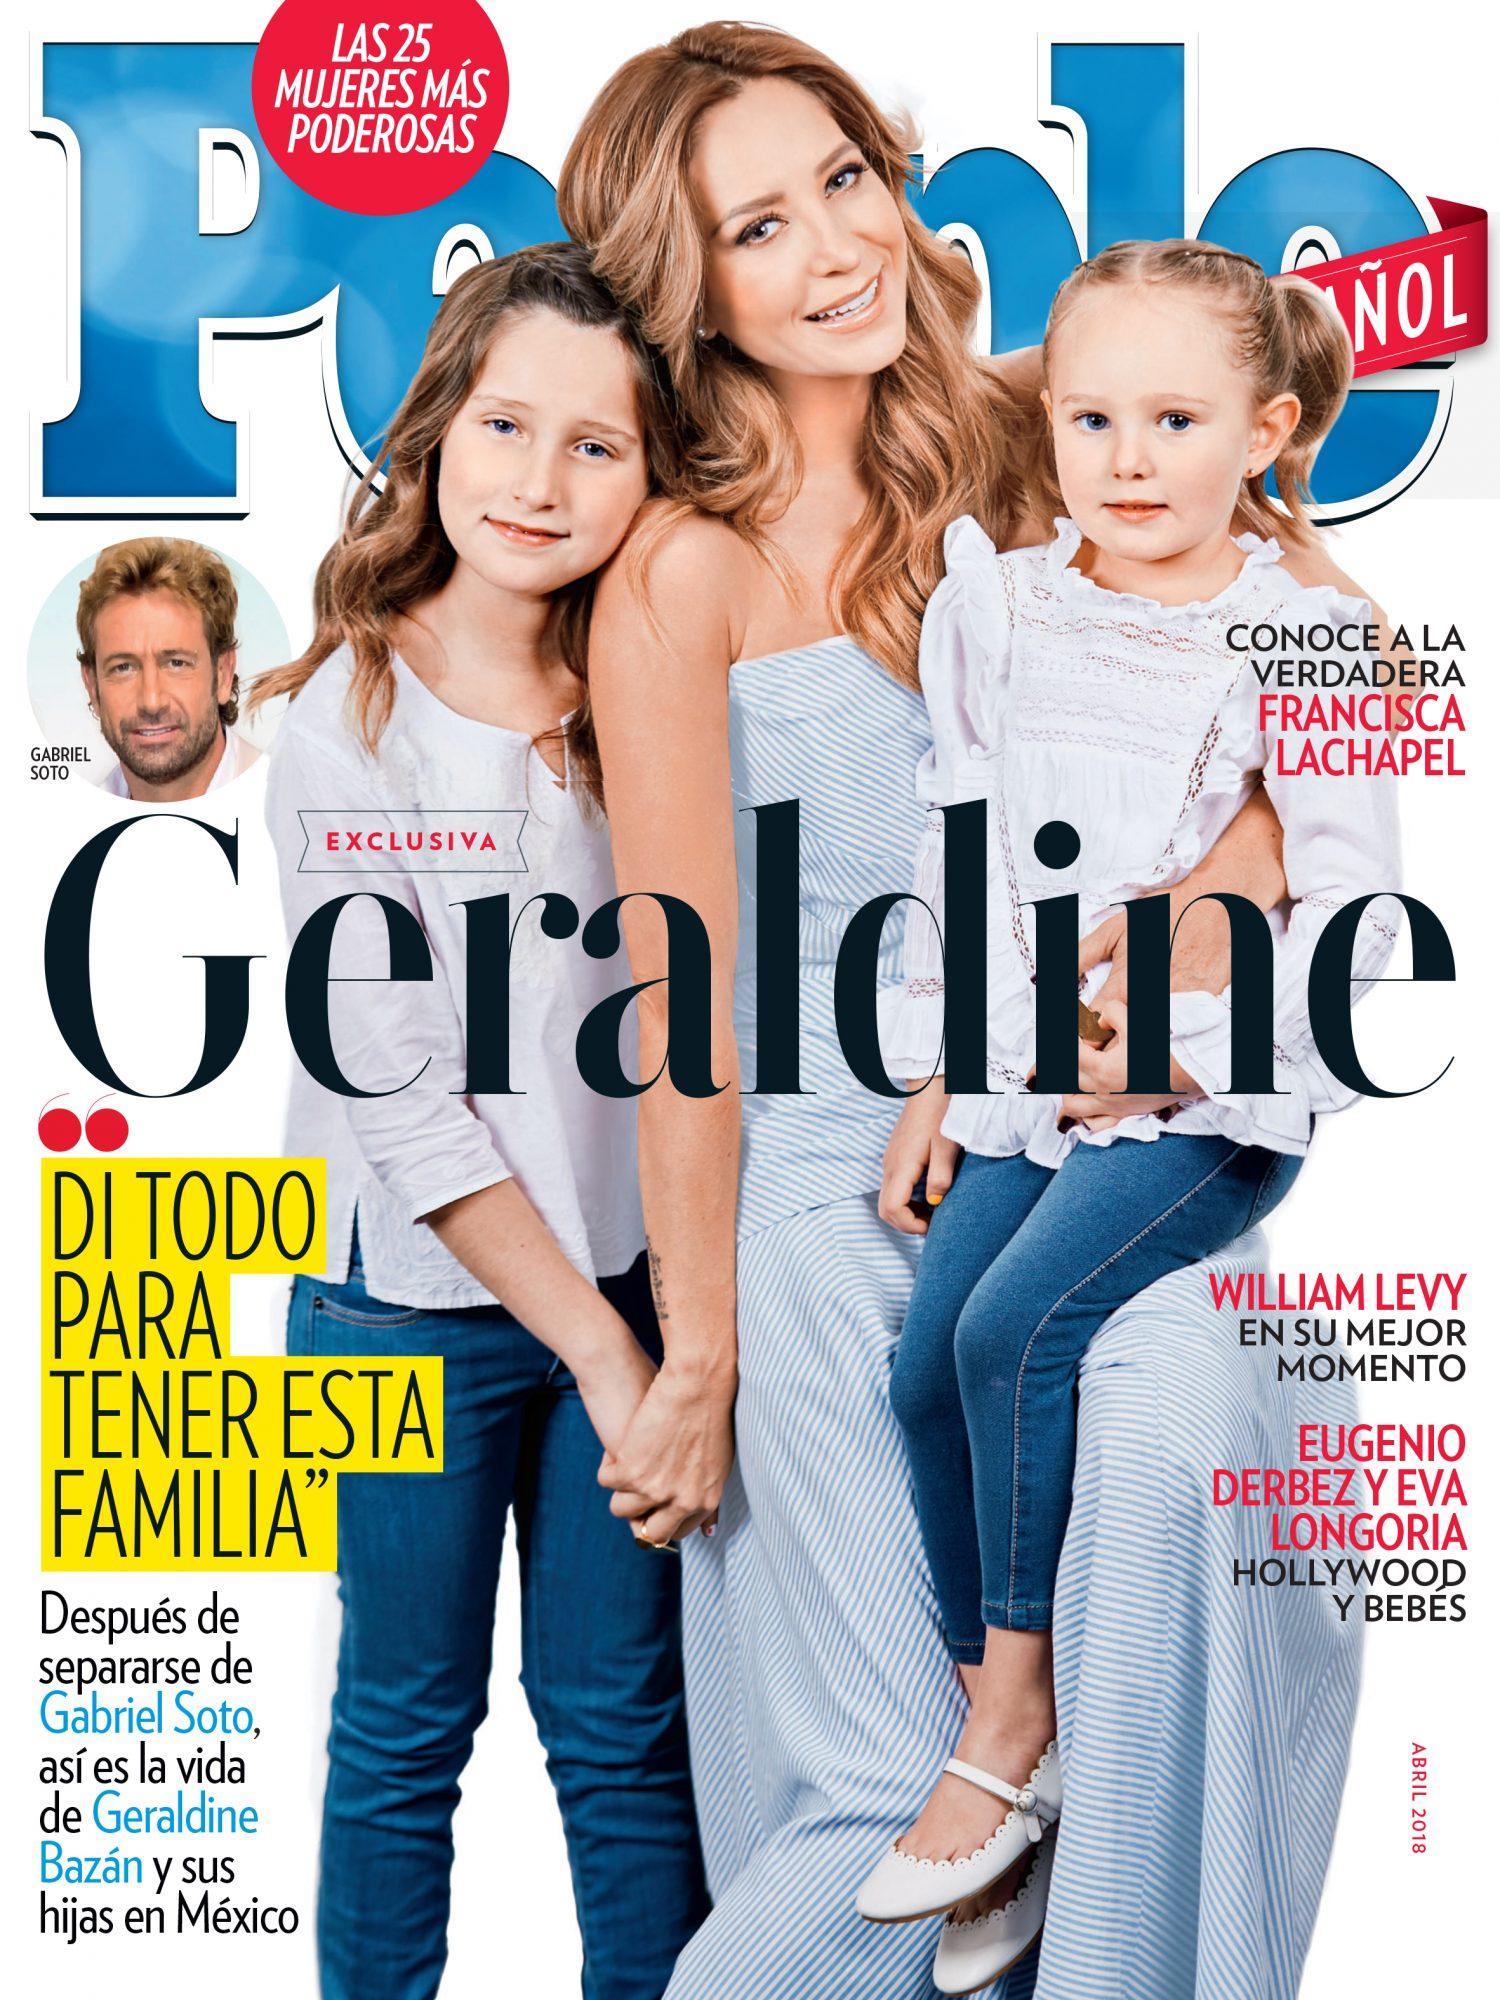 Abril 2018 portada - Las 25 Mujeres Mas Poderosas Cover - Geraldine Bazan